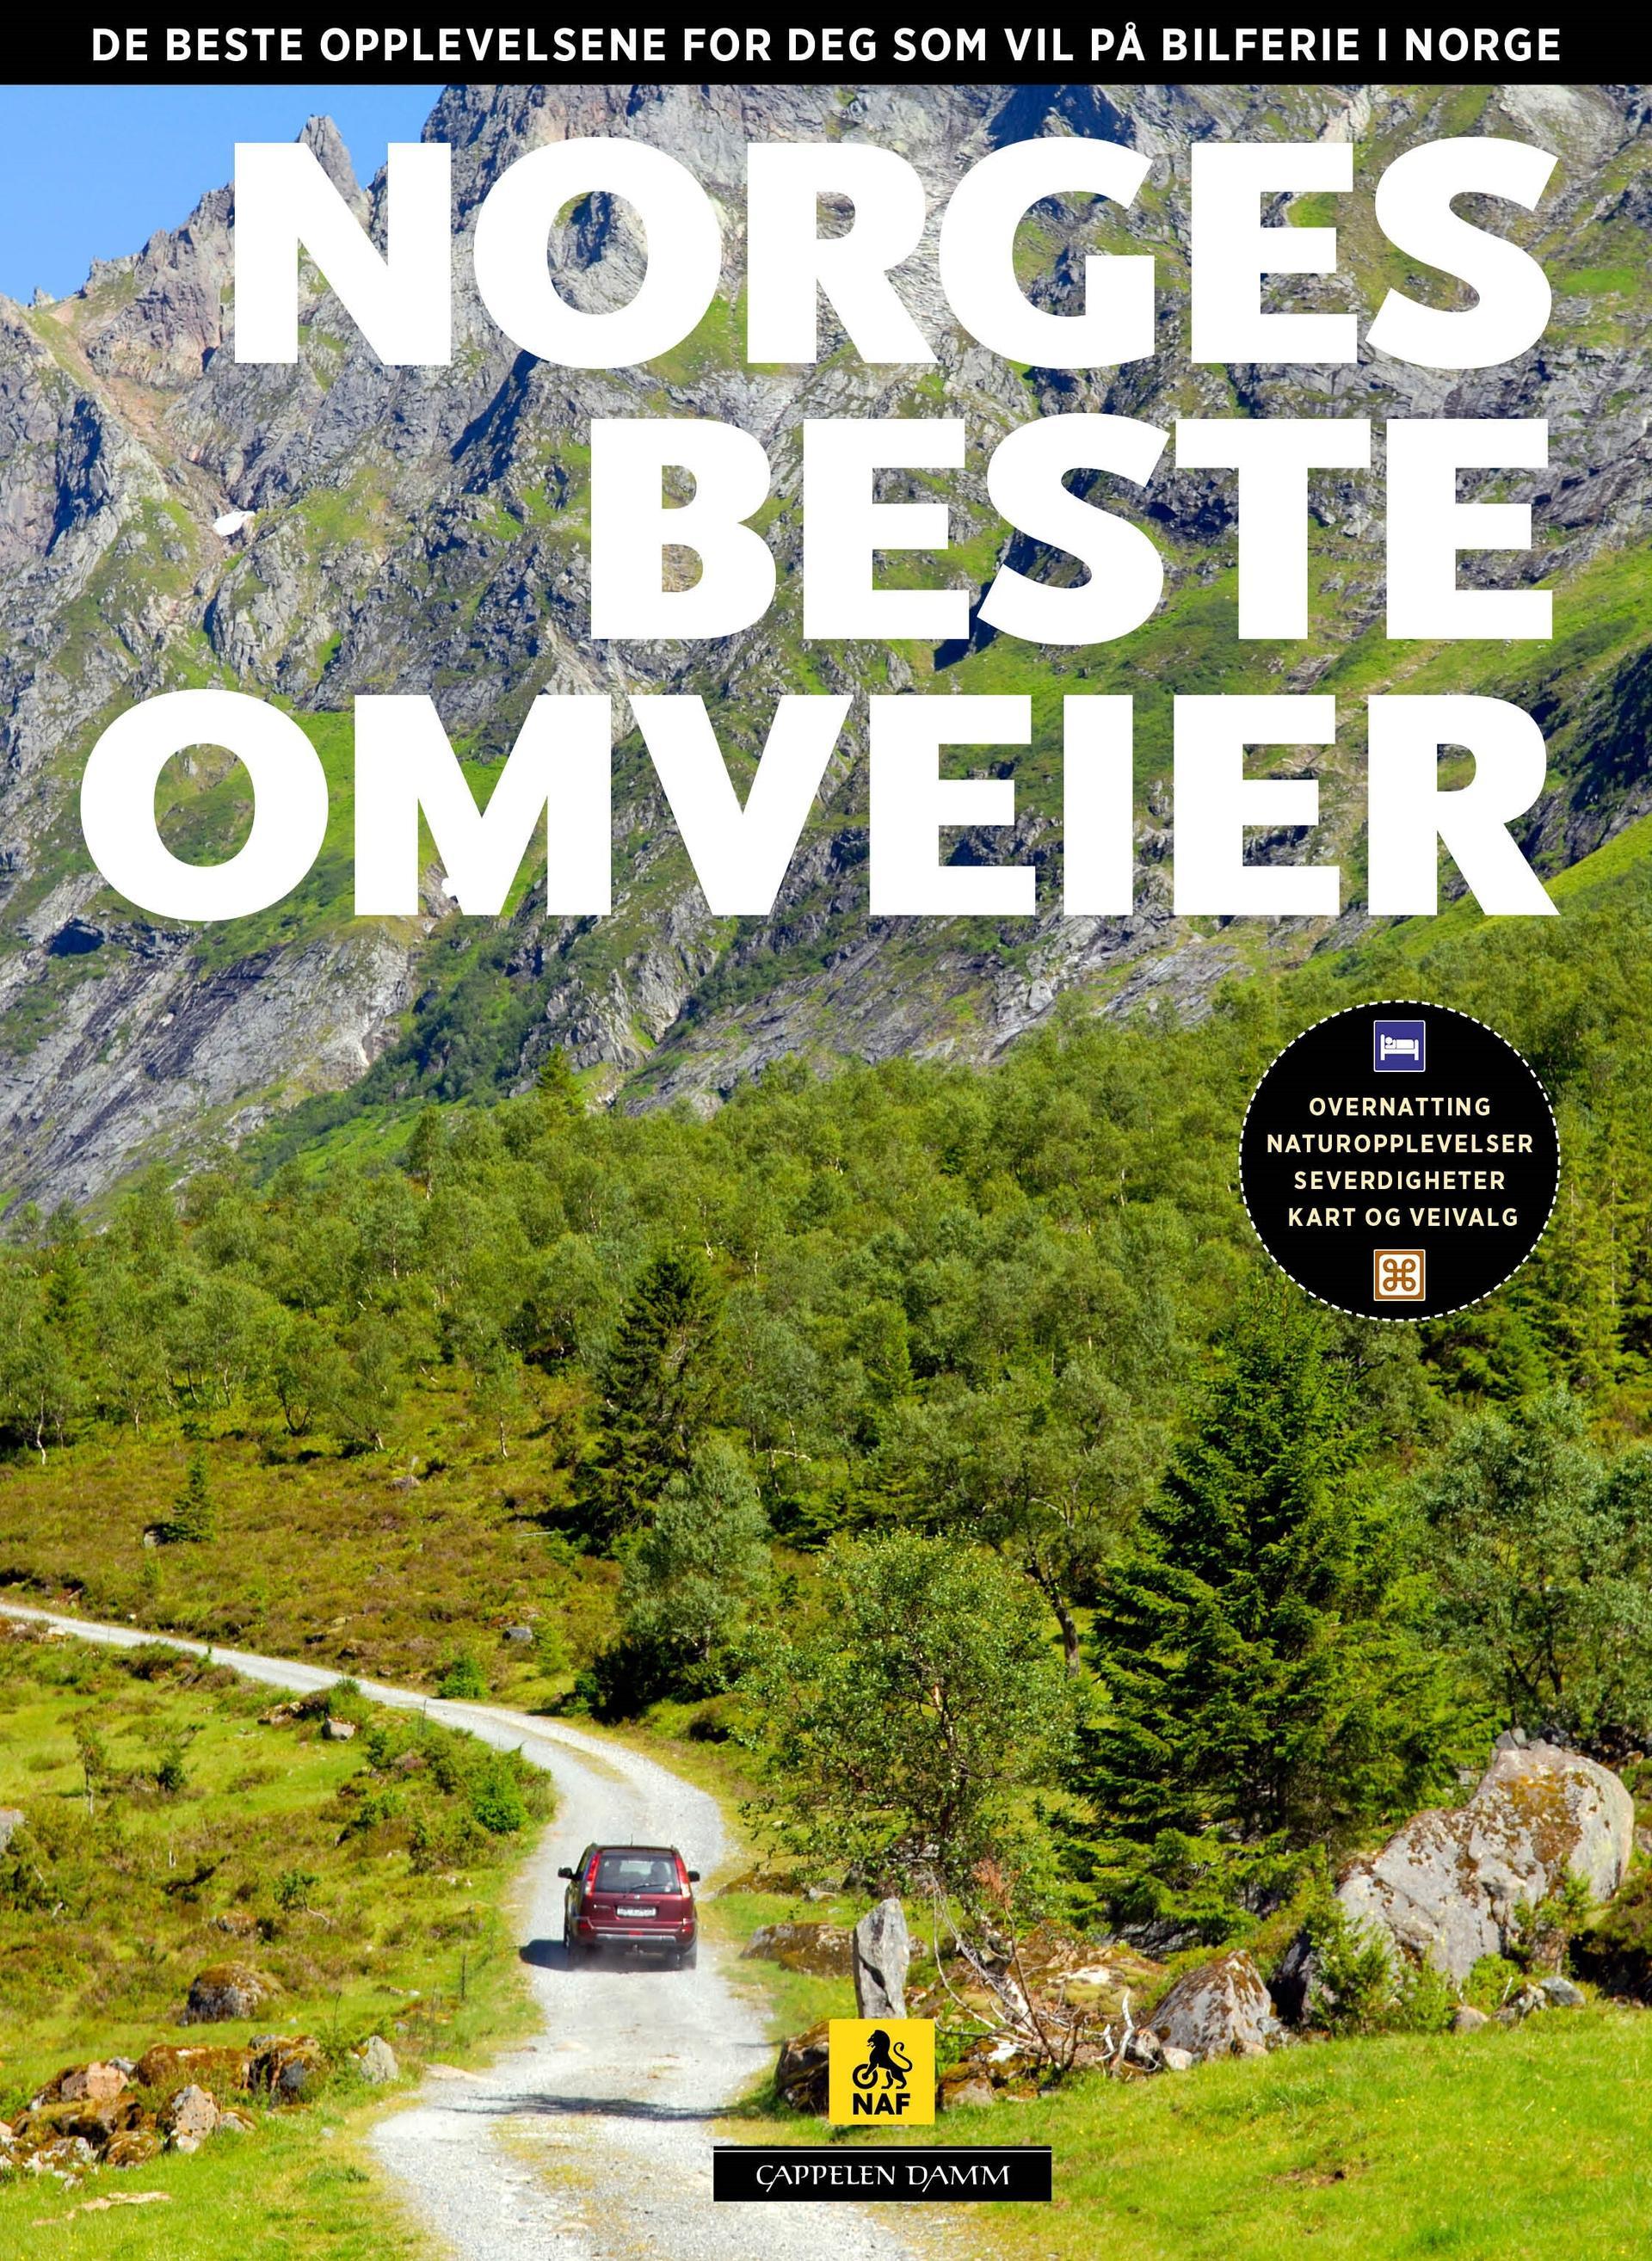 Norges beste omveier om Norgeferie av Per Roger Lauritzen og Reidar Stangenes